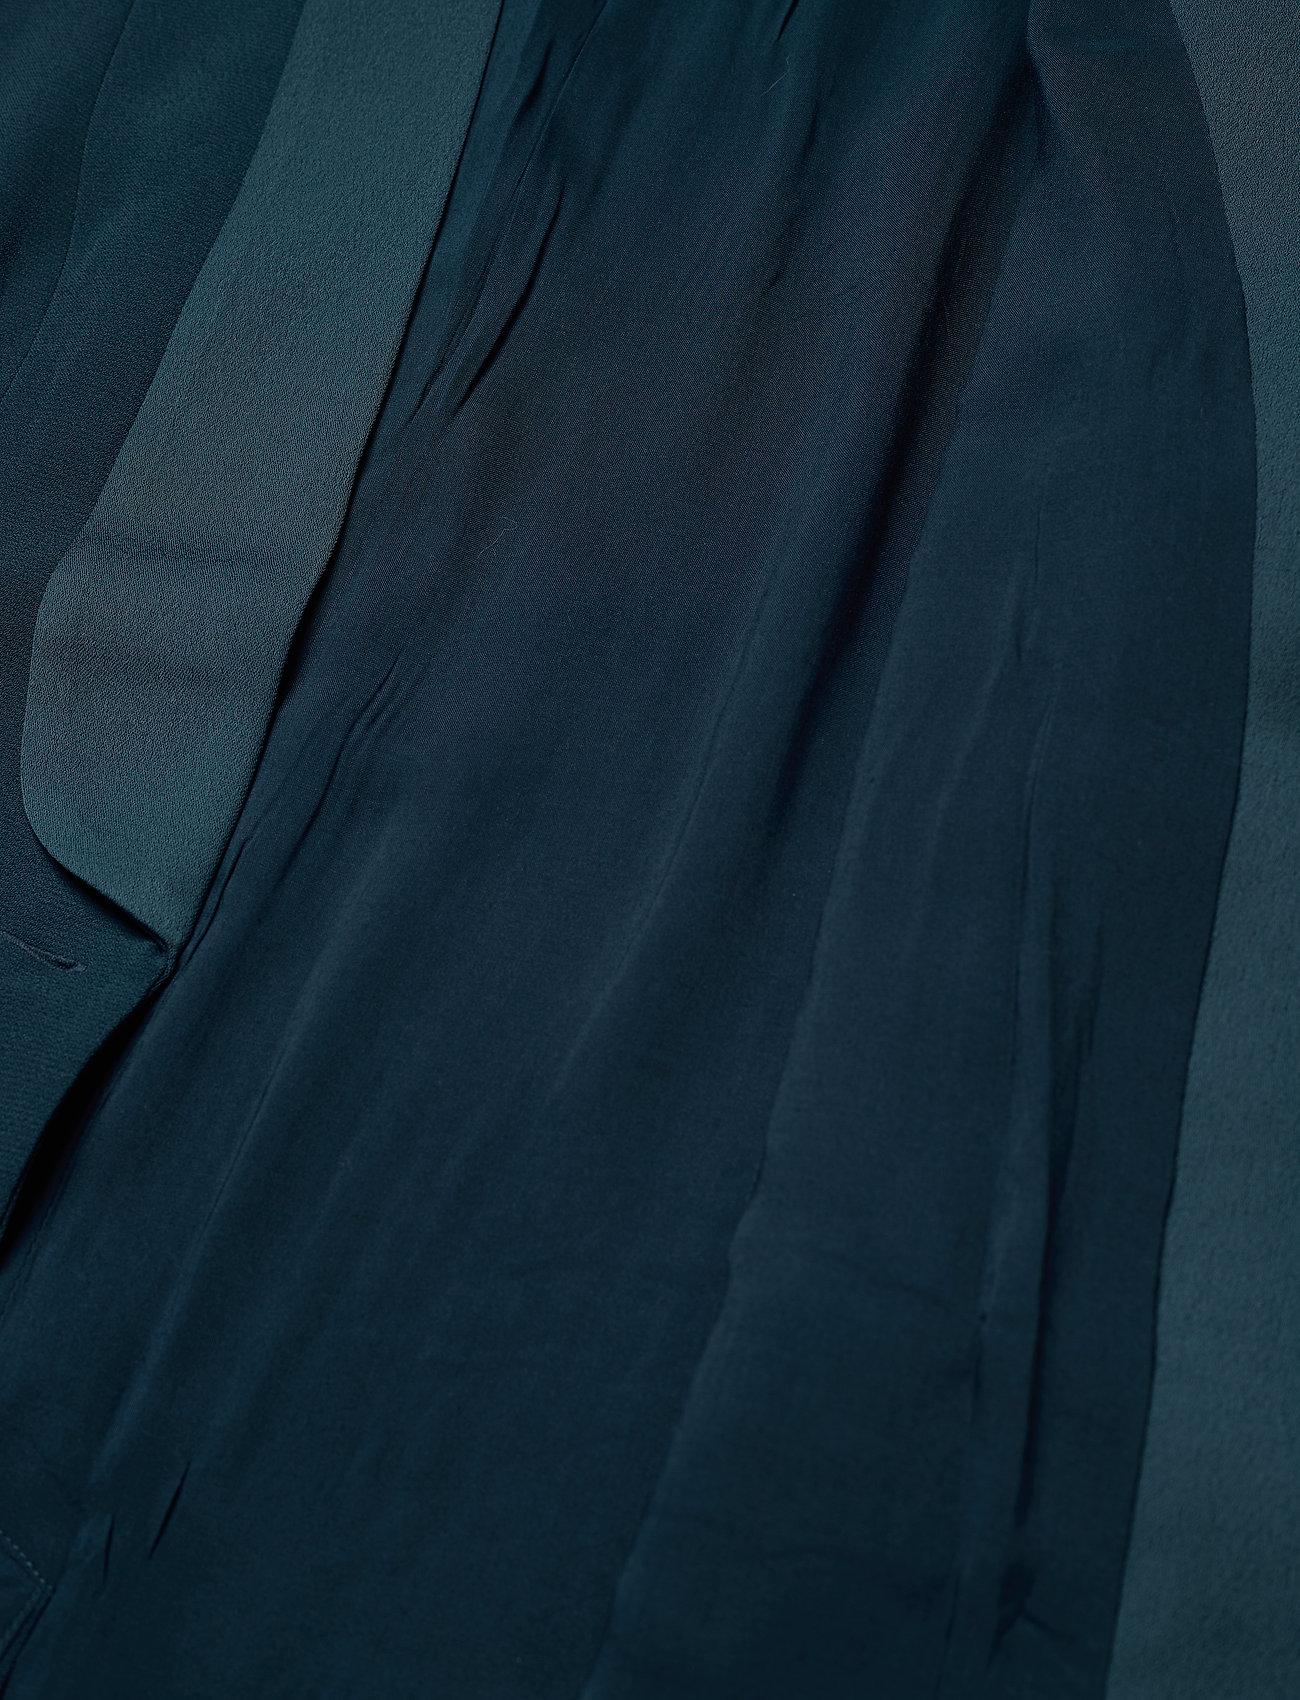 Blazer (Midnight Navy) (120.25 €) - Ilse Jacobsen NrdIm